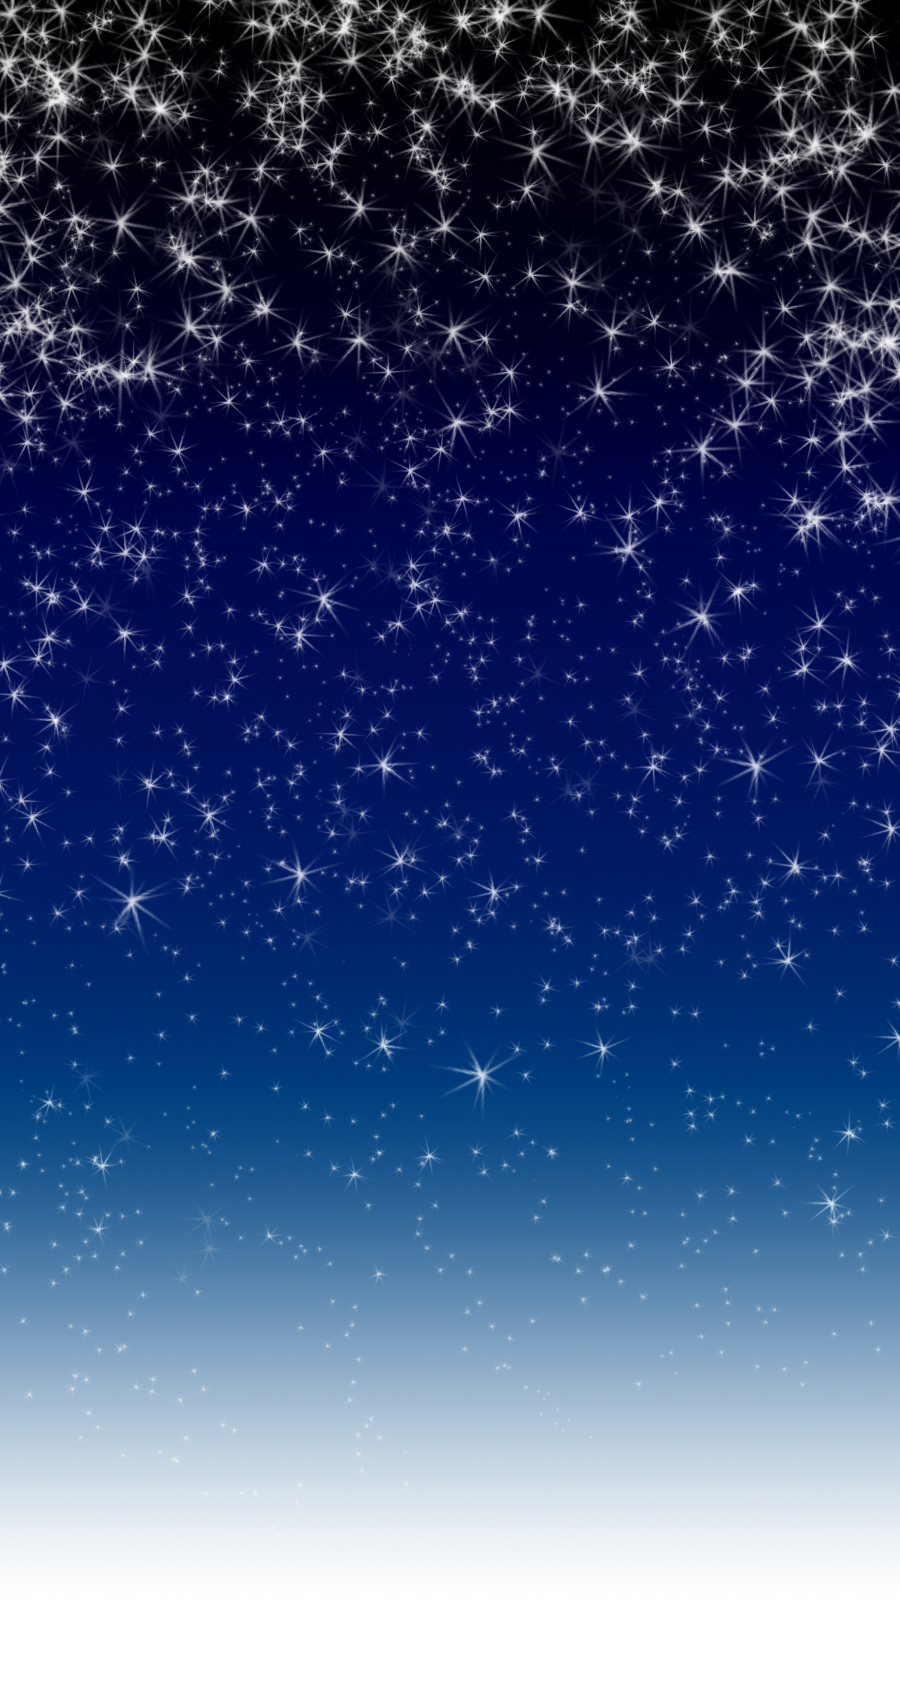 the secret beneath the starry sky essay Creative writing essays - the secret beneath the starry sky.